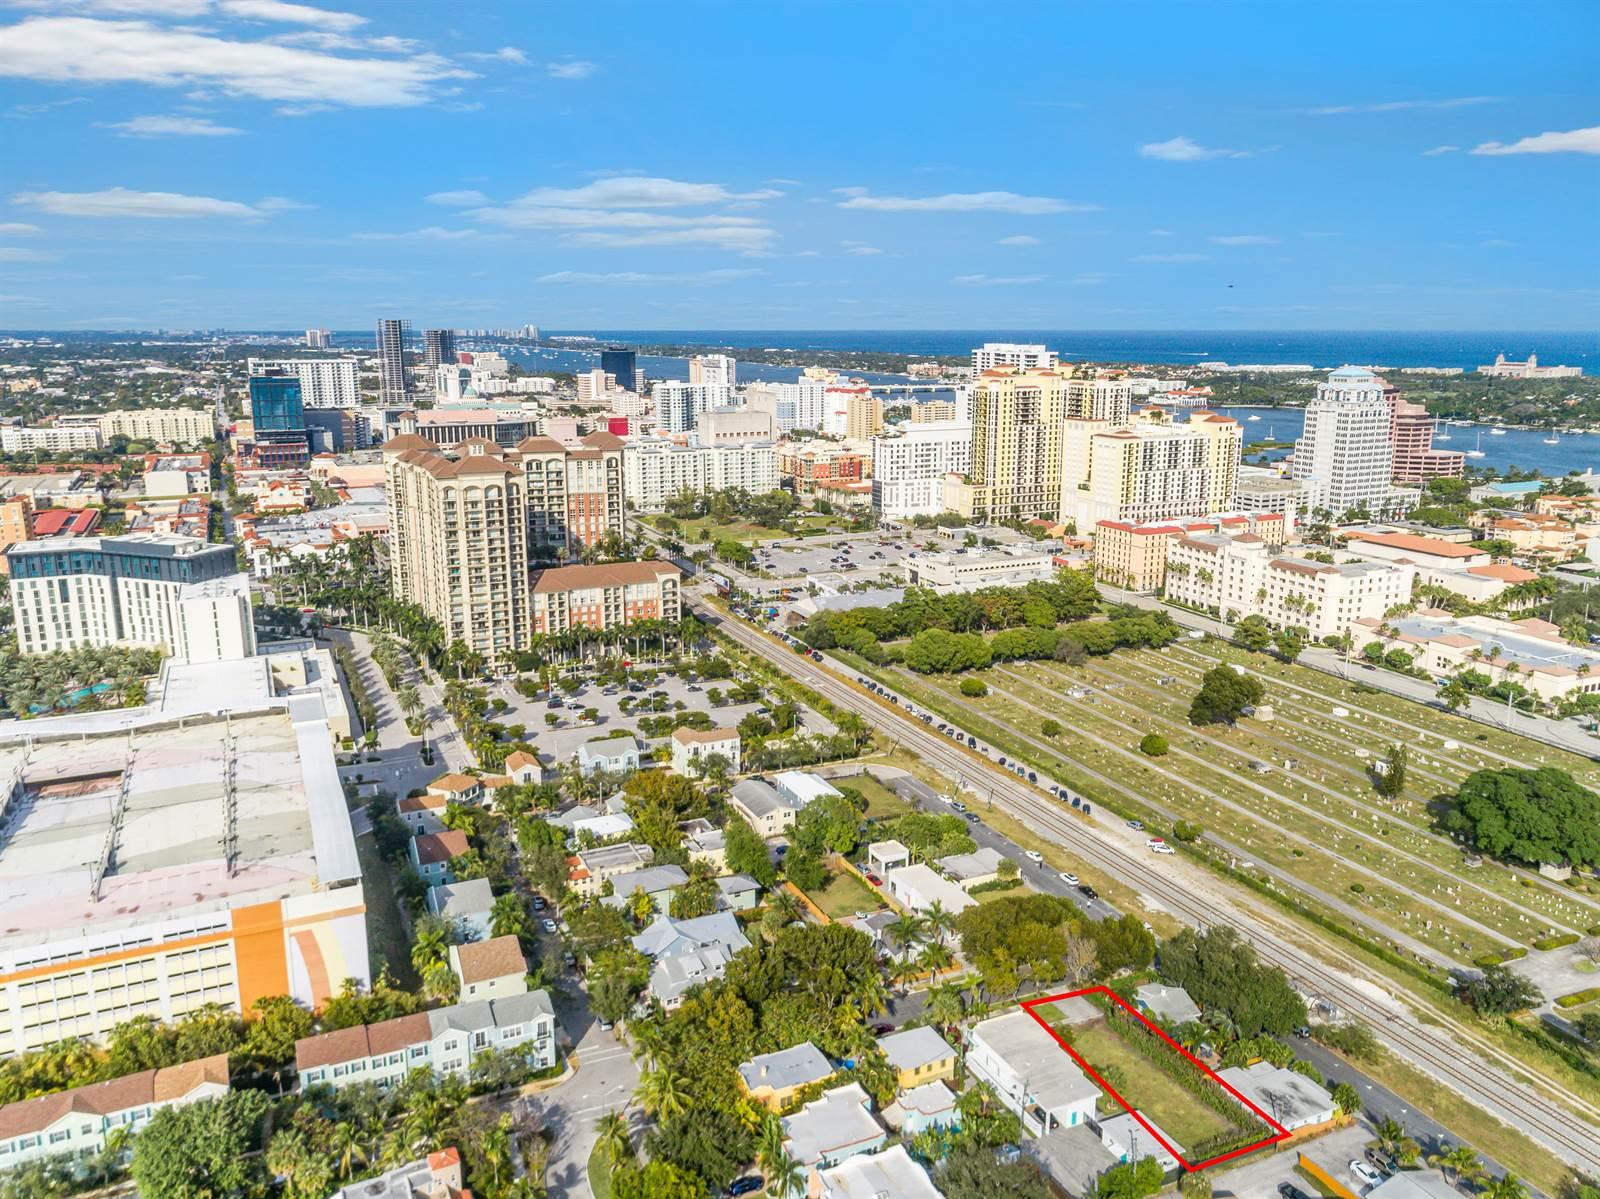 504 N Street, West Palm Beach, FL 33401